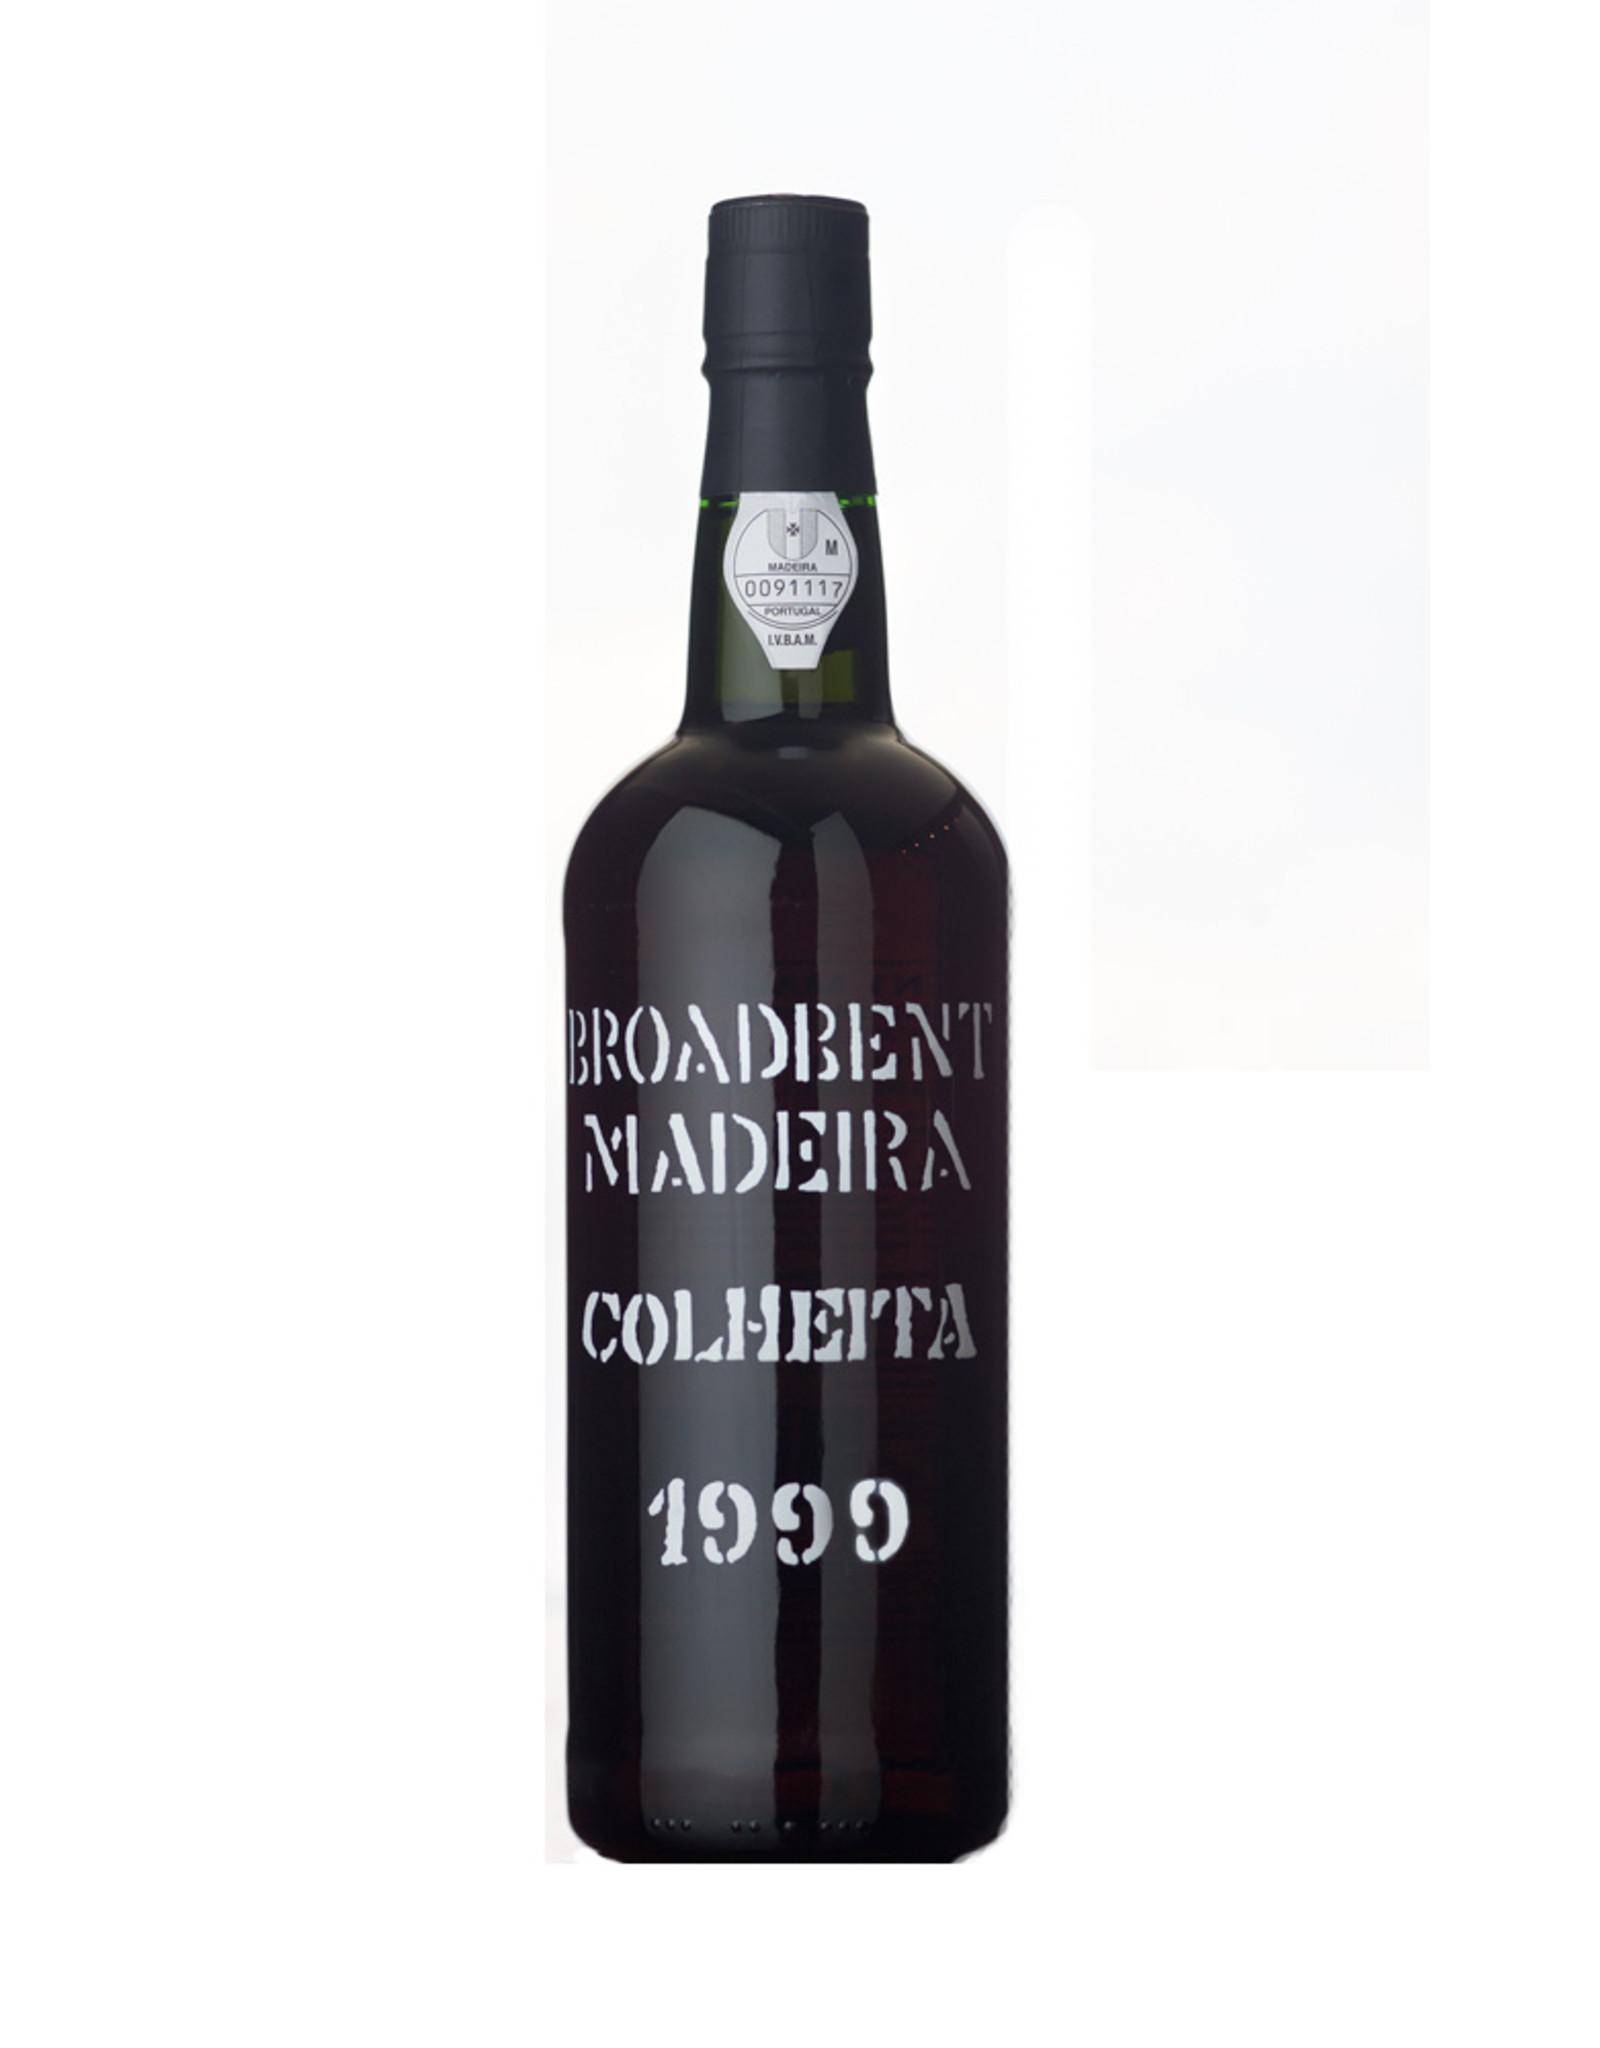 Broadbent Colheita 1999 Madeira